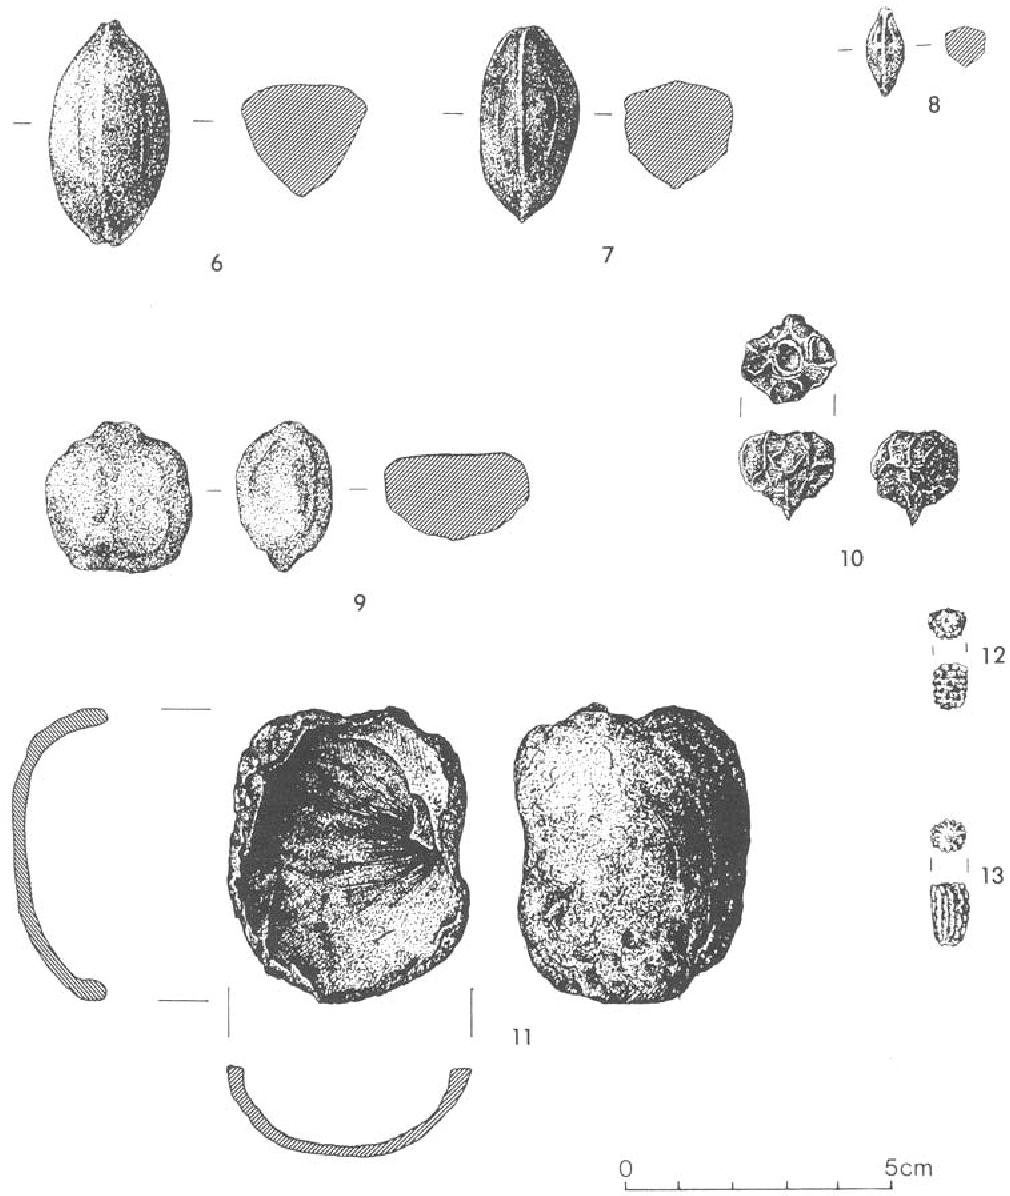 figure 6-13